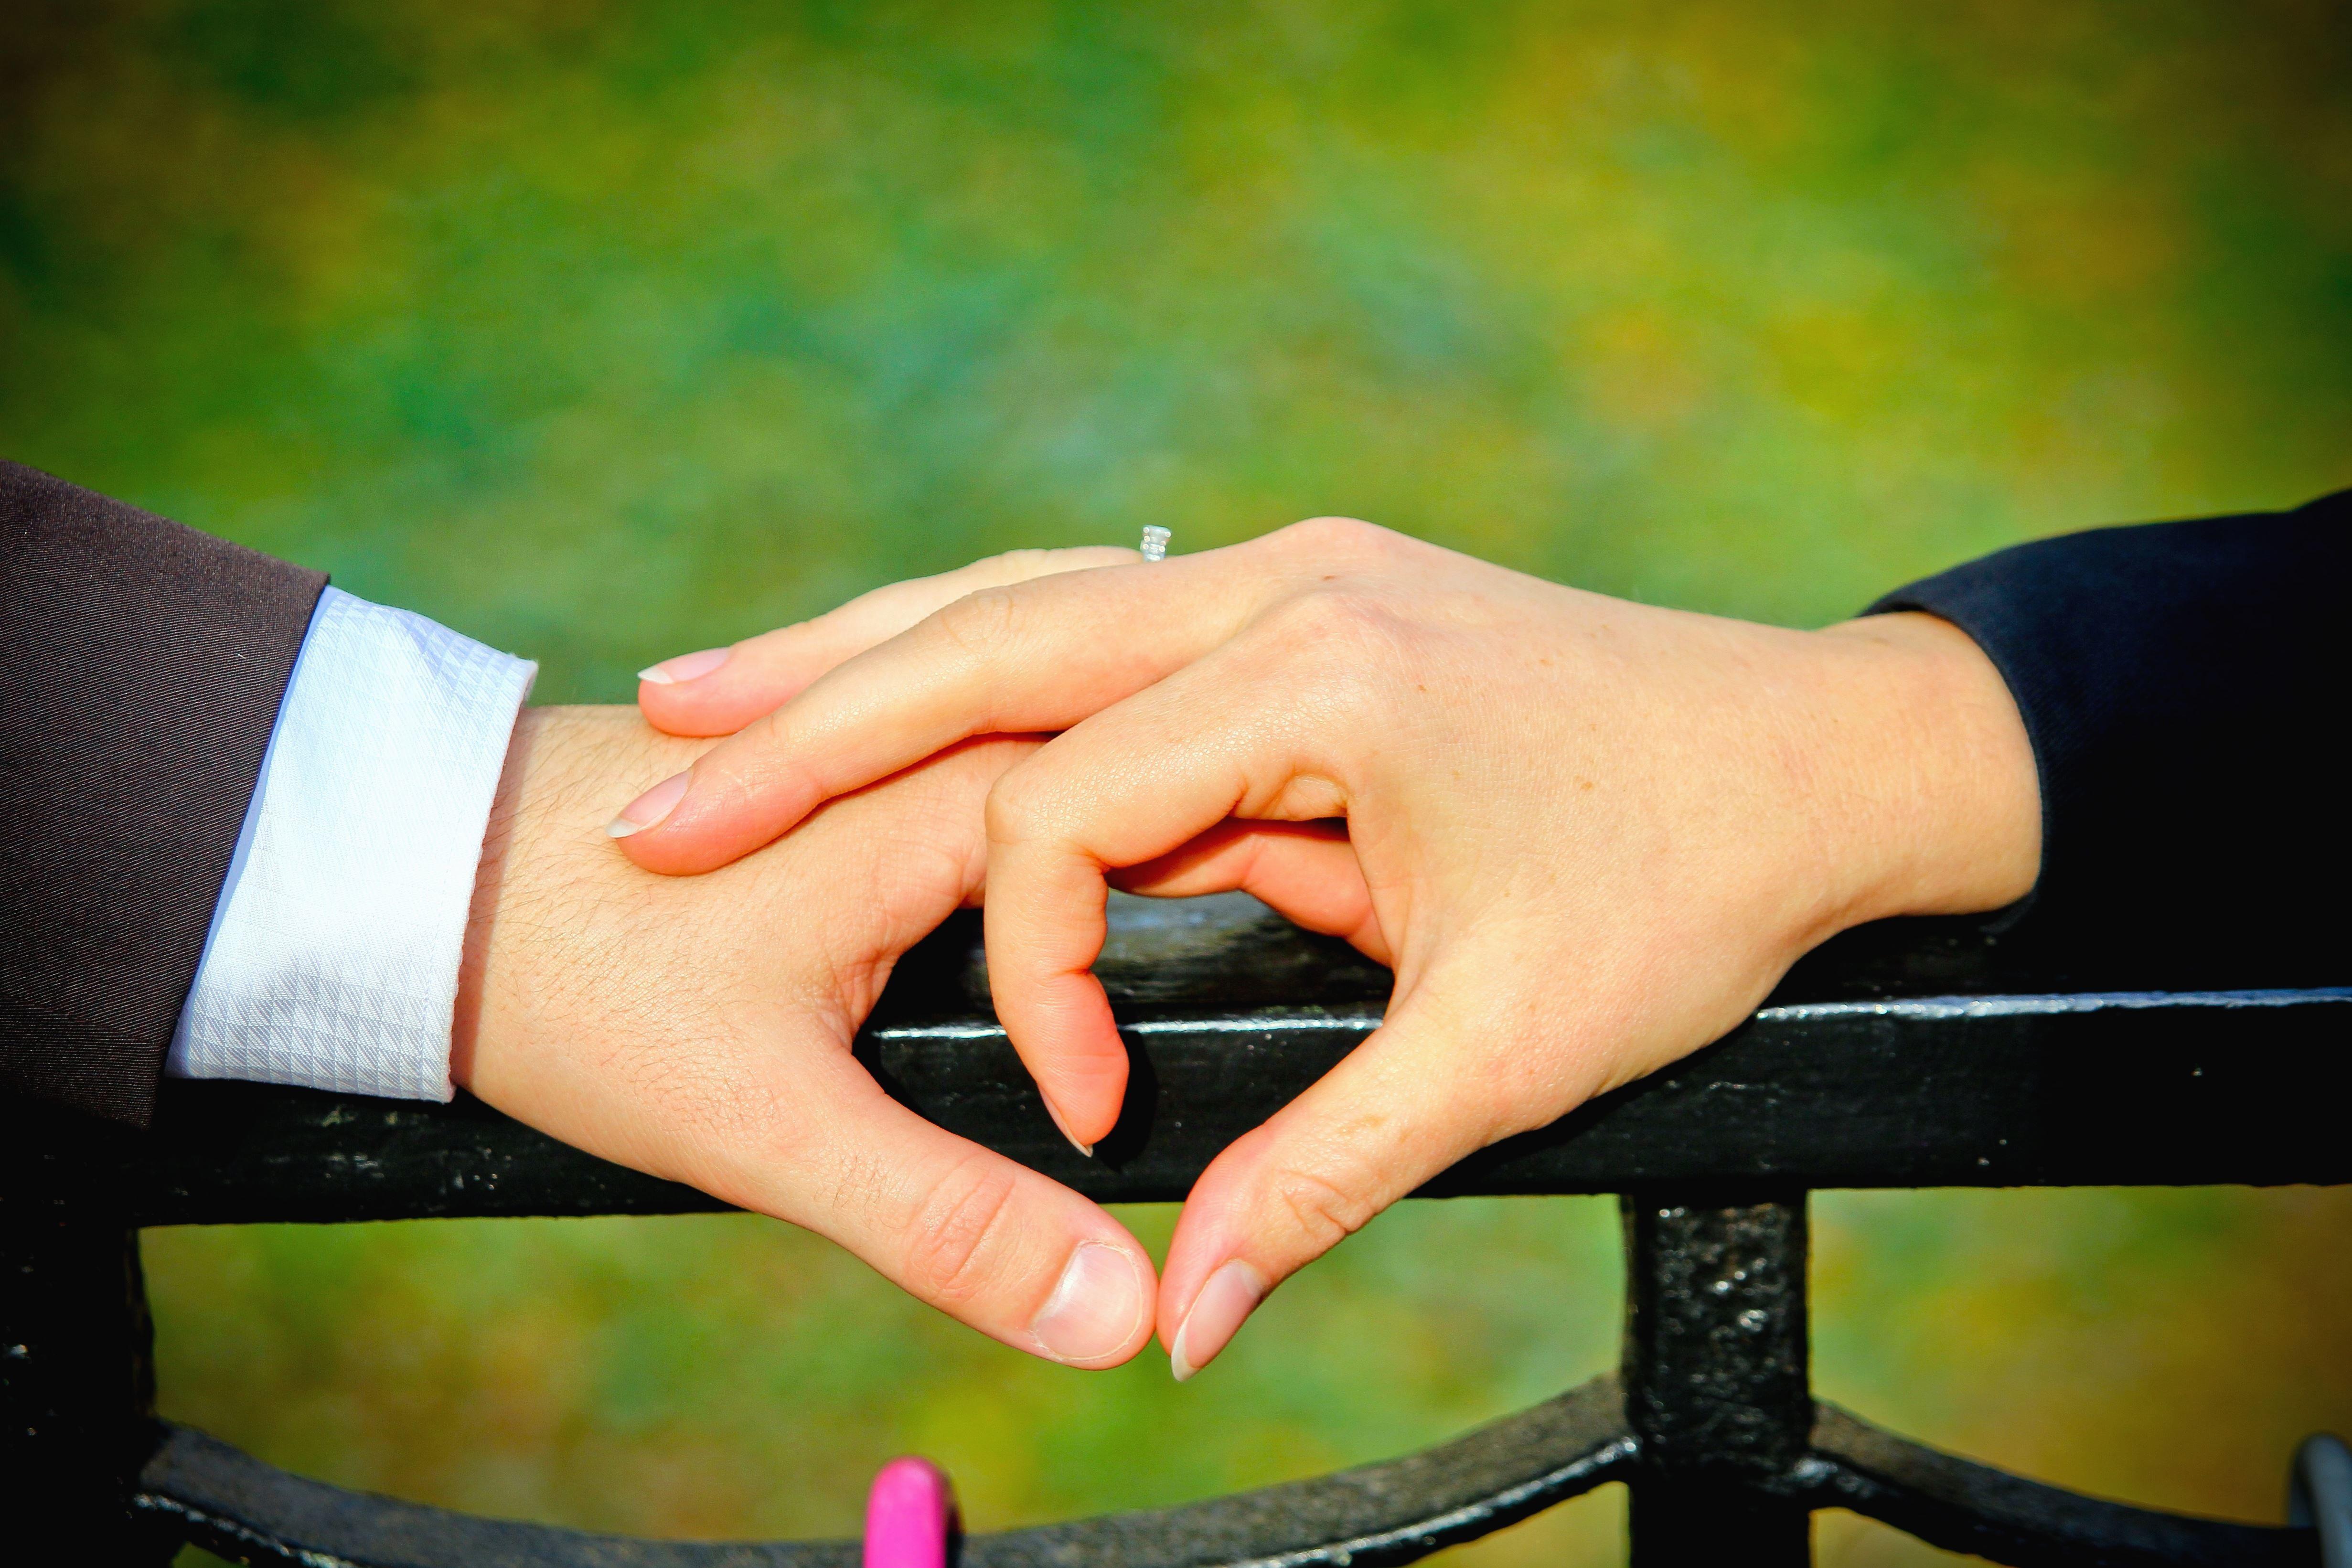 Imagen gratis: Hombre, mujer, mano, dedo, anillo, boda